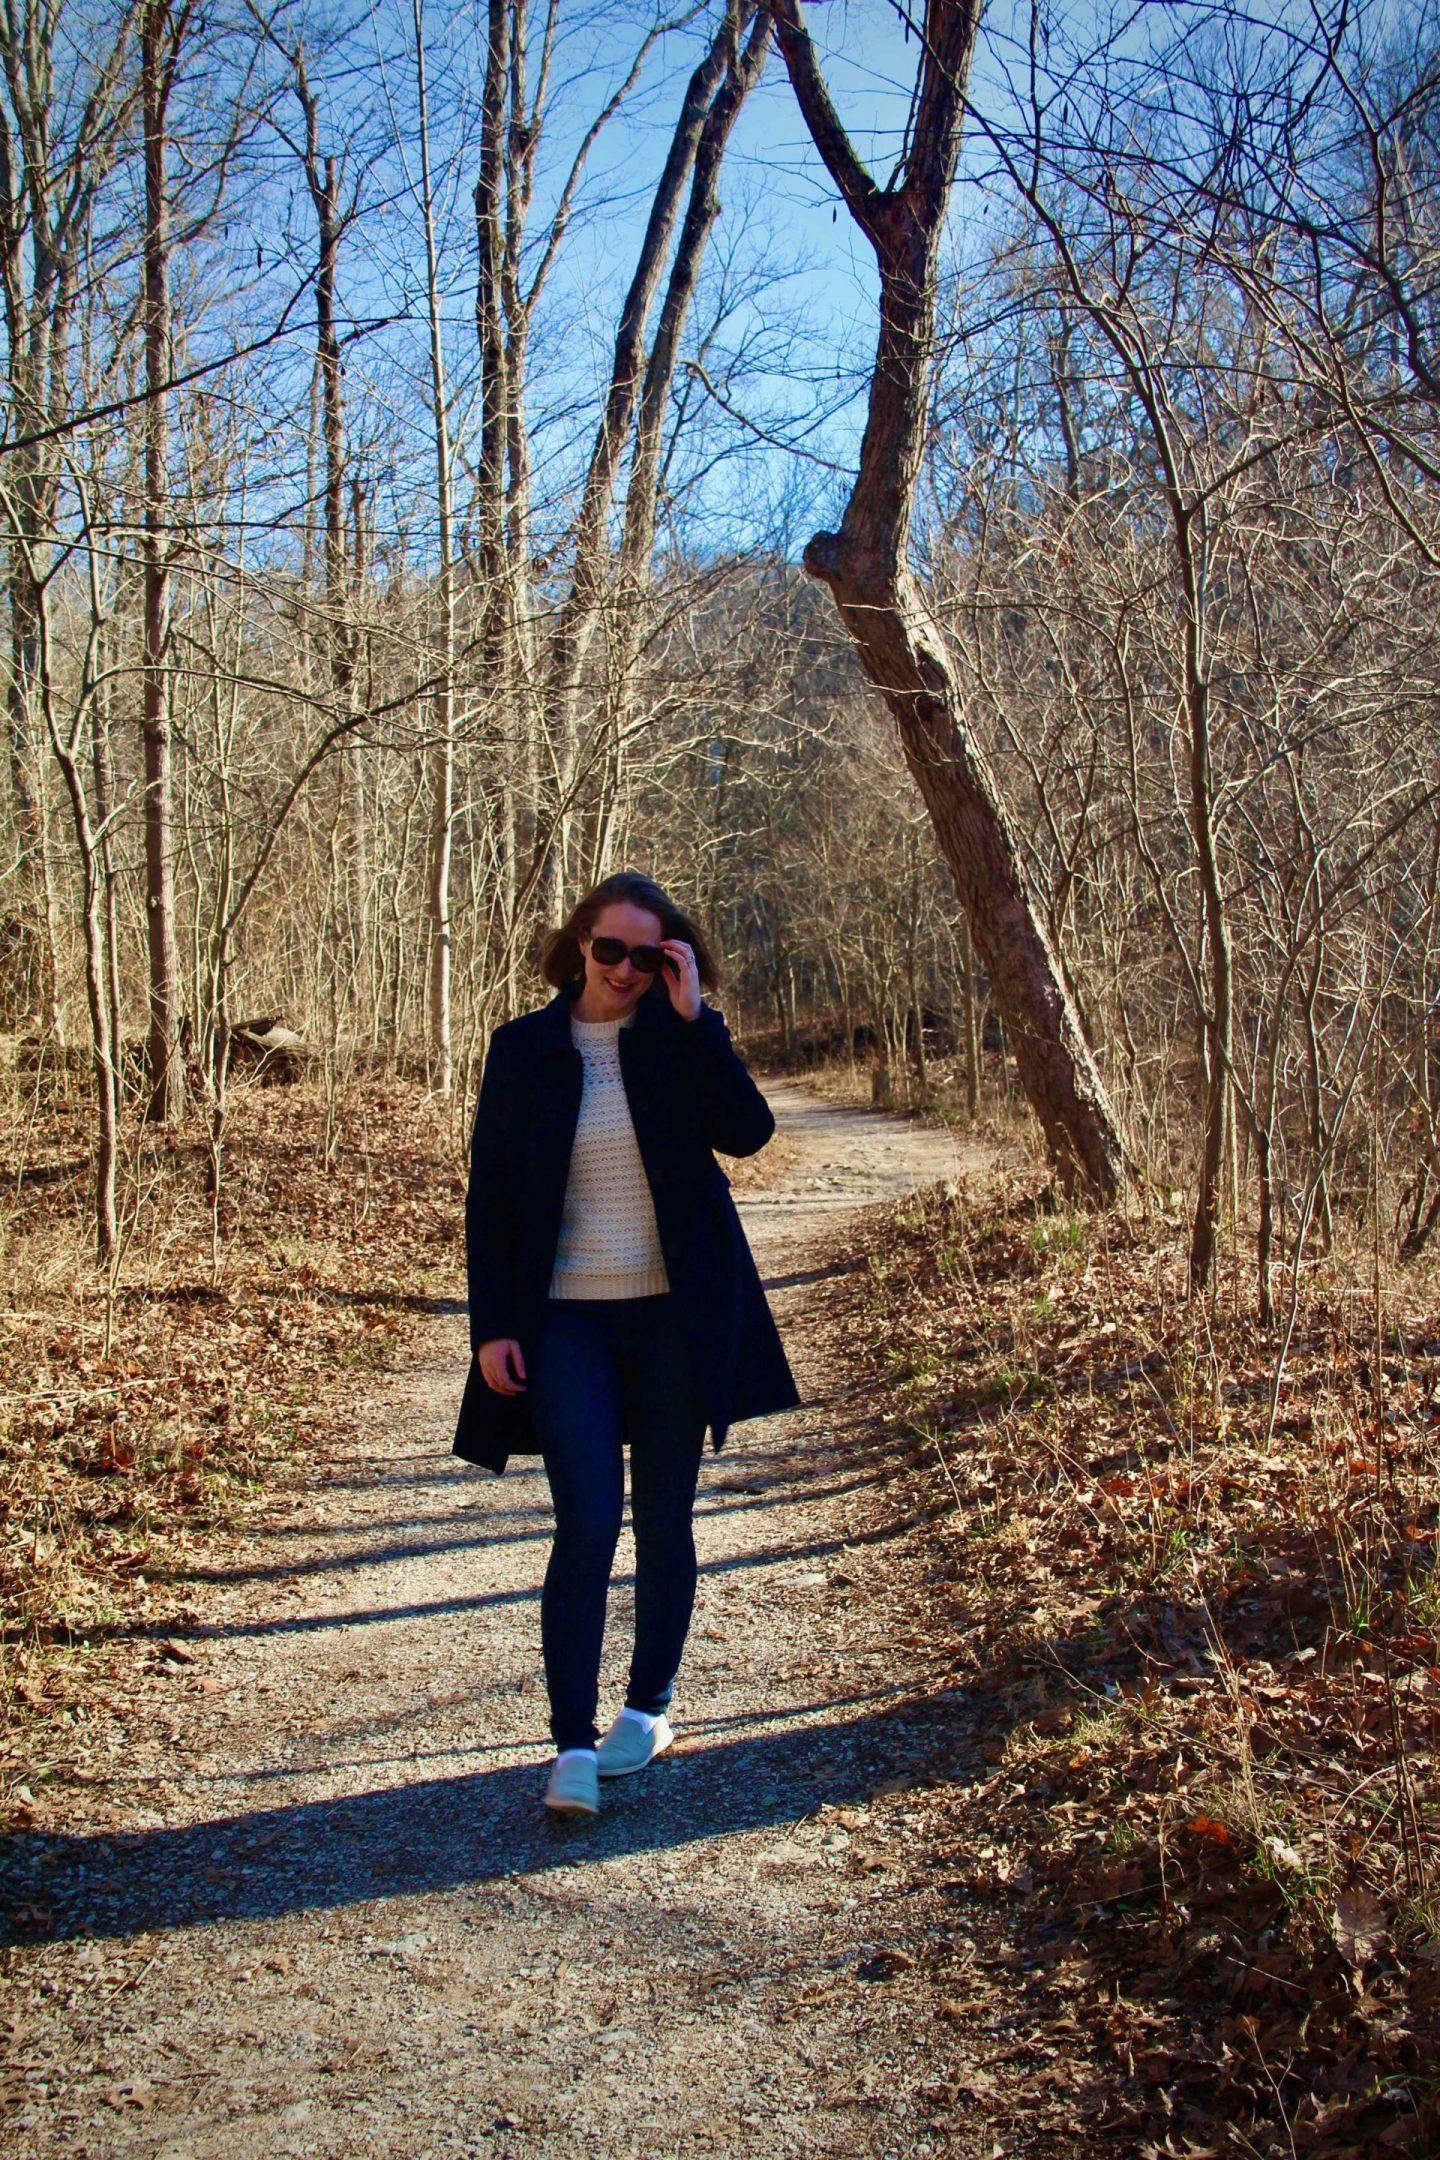 Everyday Adventure in Cincinnati | Walks through Sharon Woods | The Spectacular Adventurer